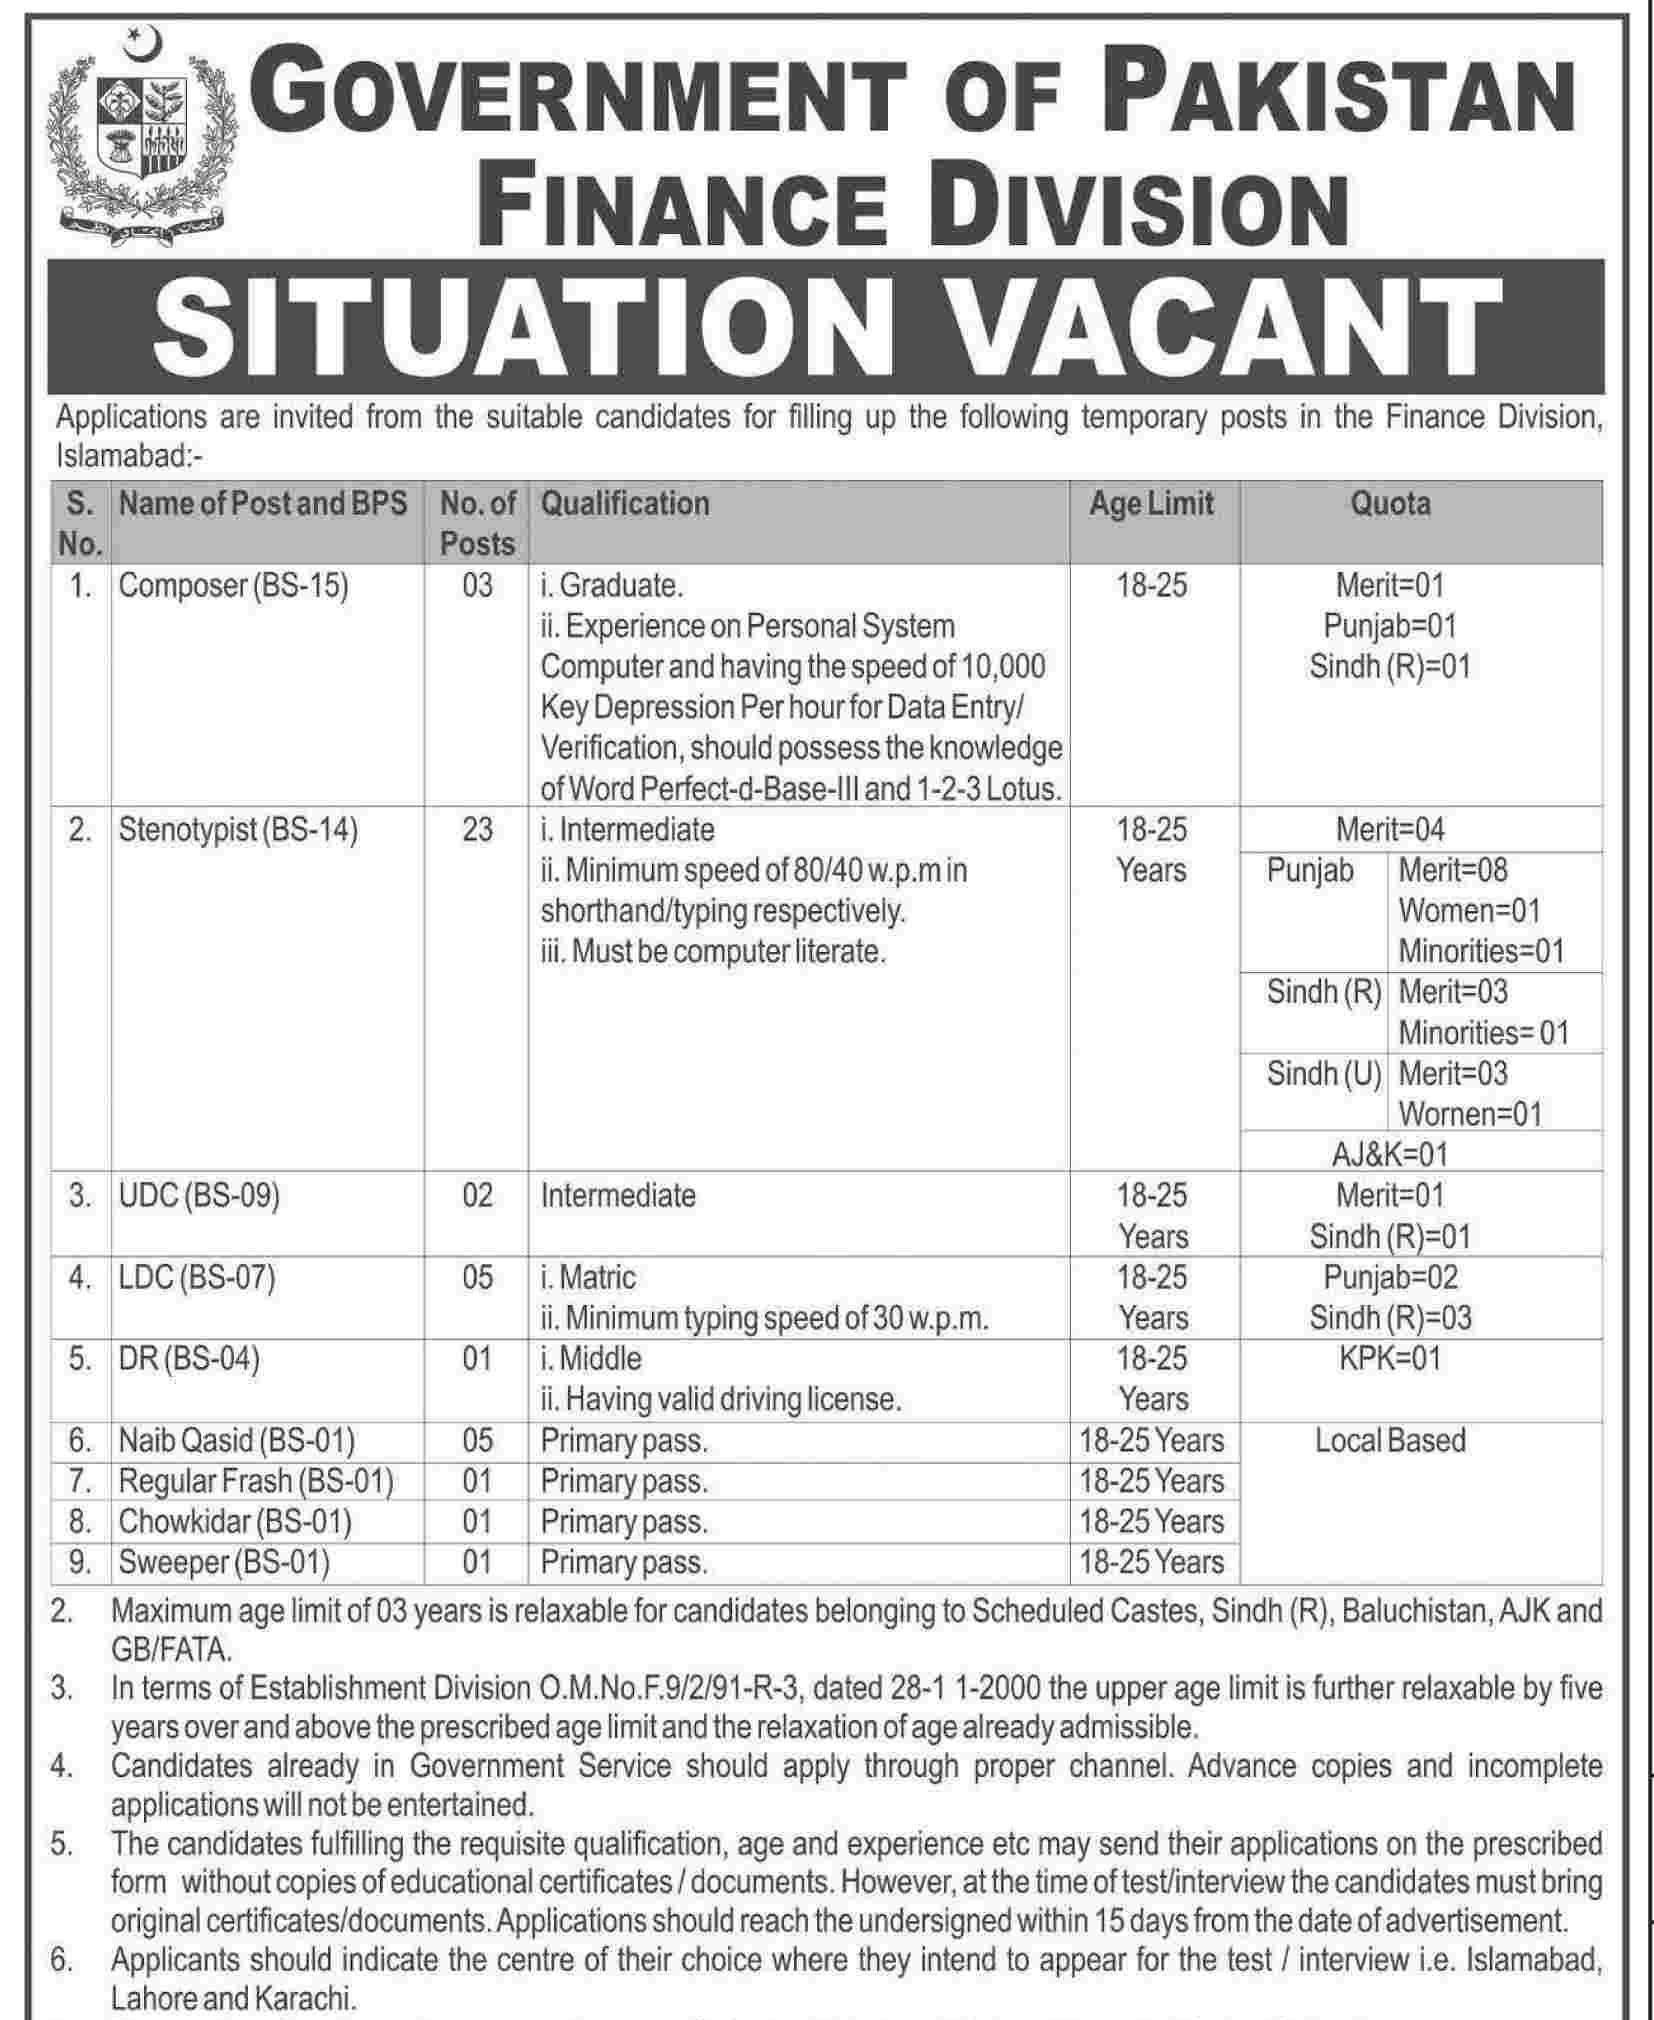 Govt Of Pakistan Finance Division Islamabad Jobs 2015 Application Form Last DateGovt Of Pakistan Finance Division Islamabad Jobs 2015 Application Form Last Date